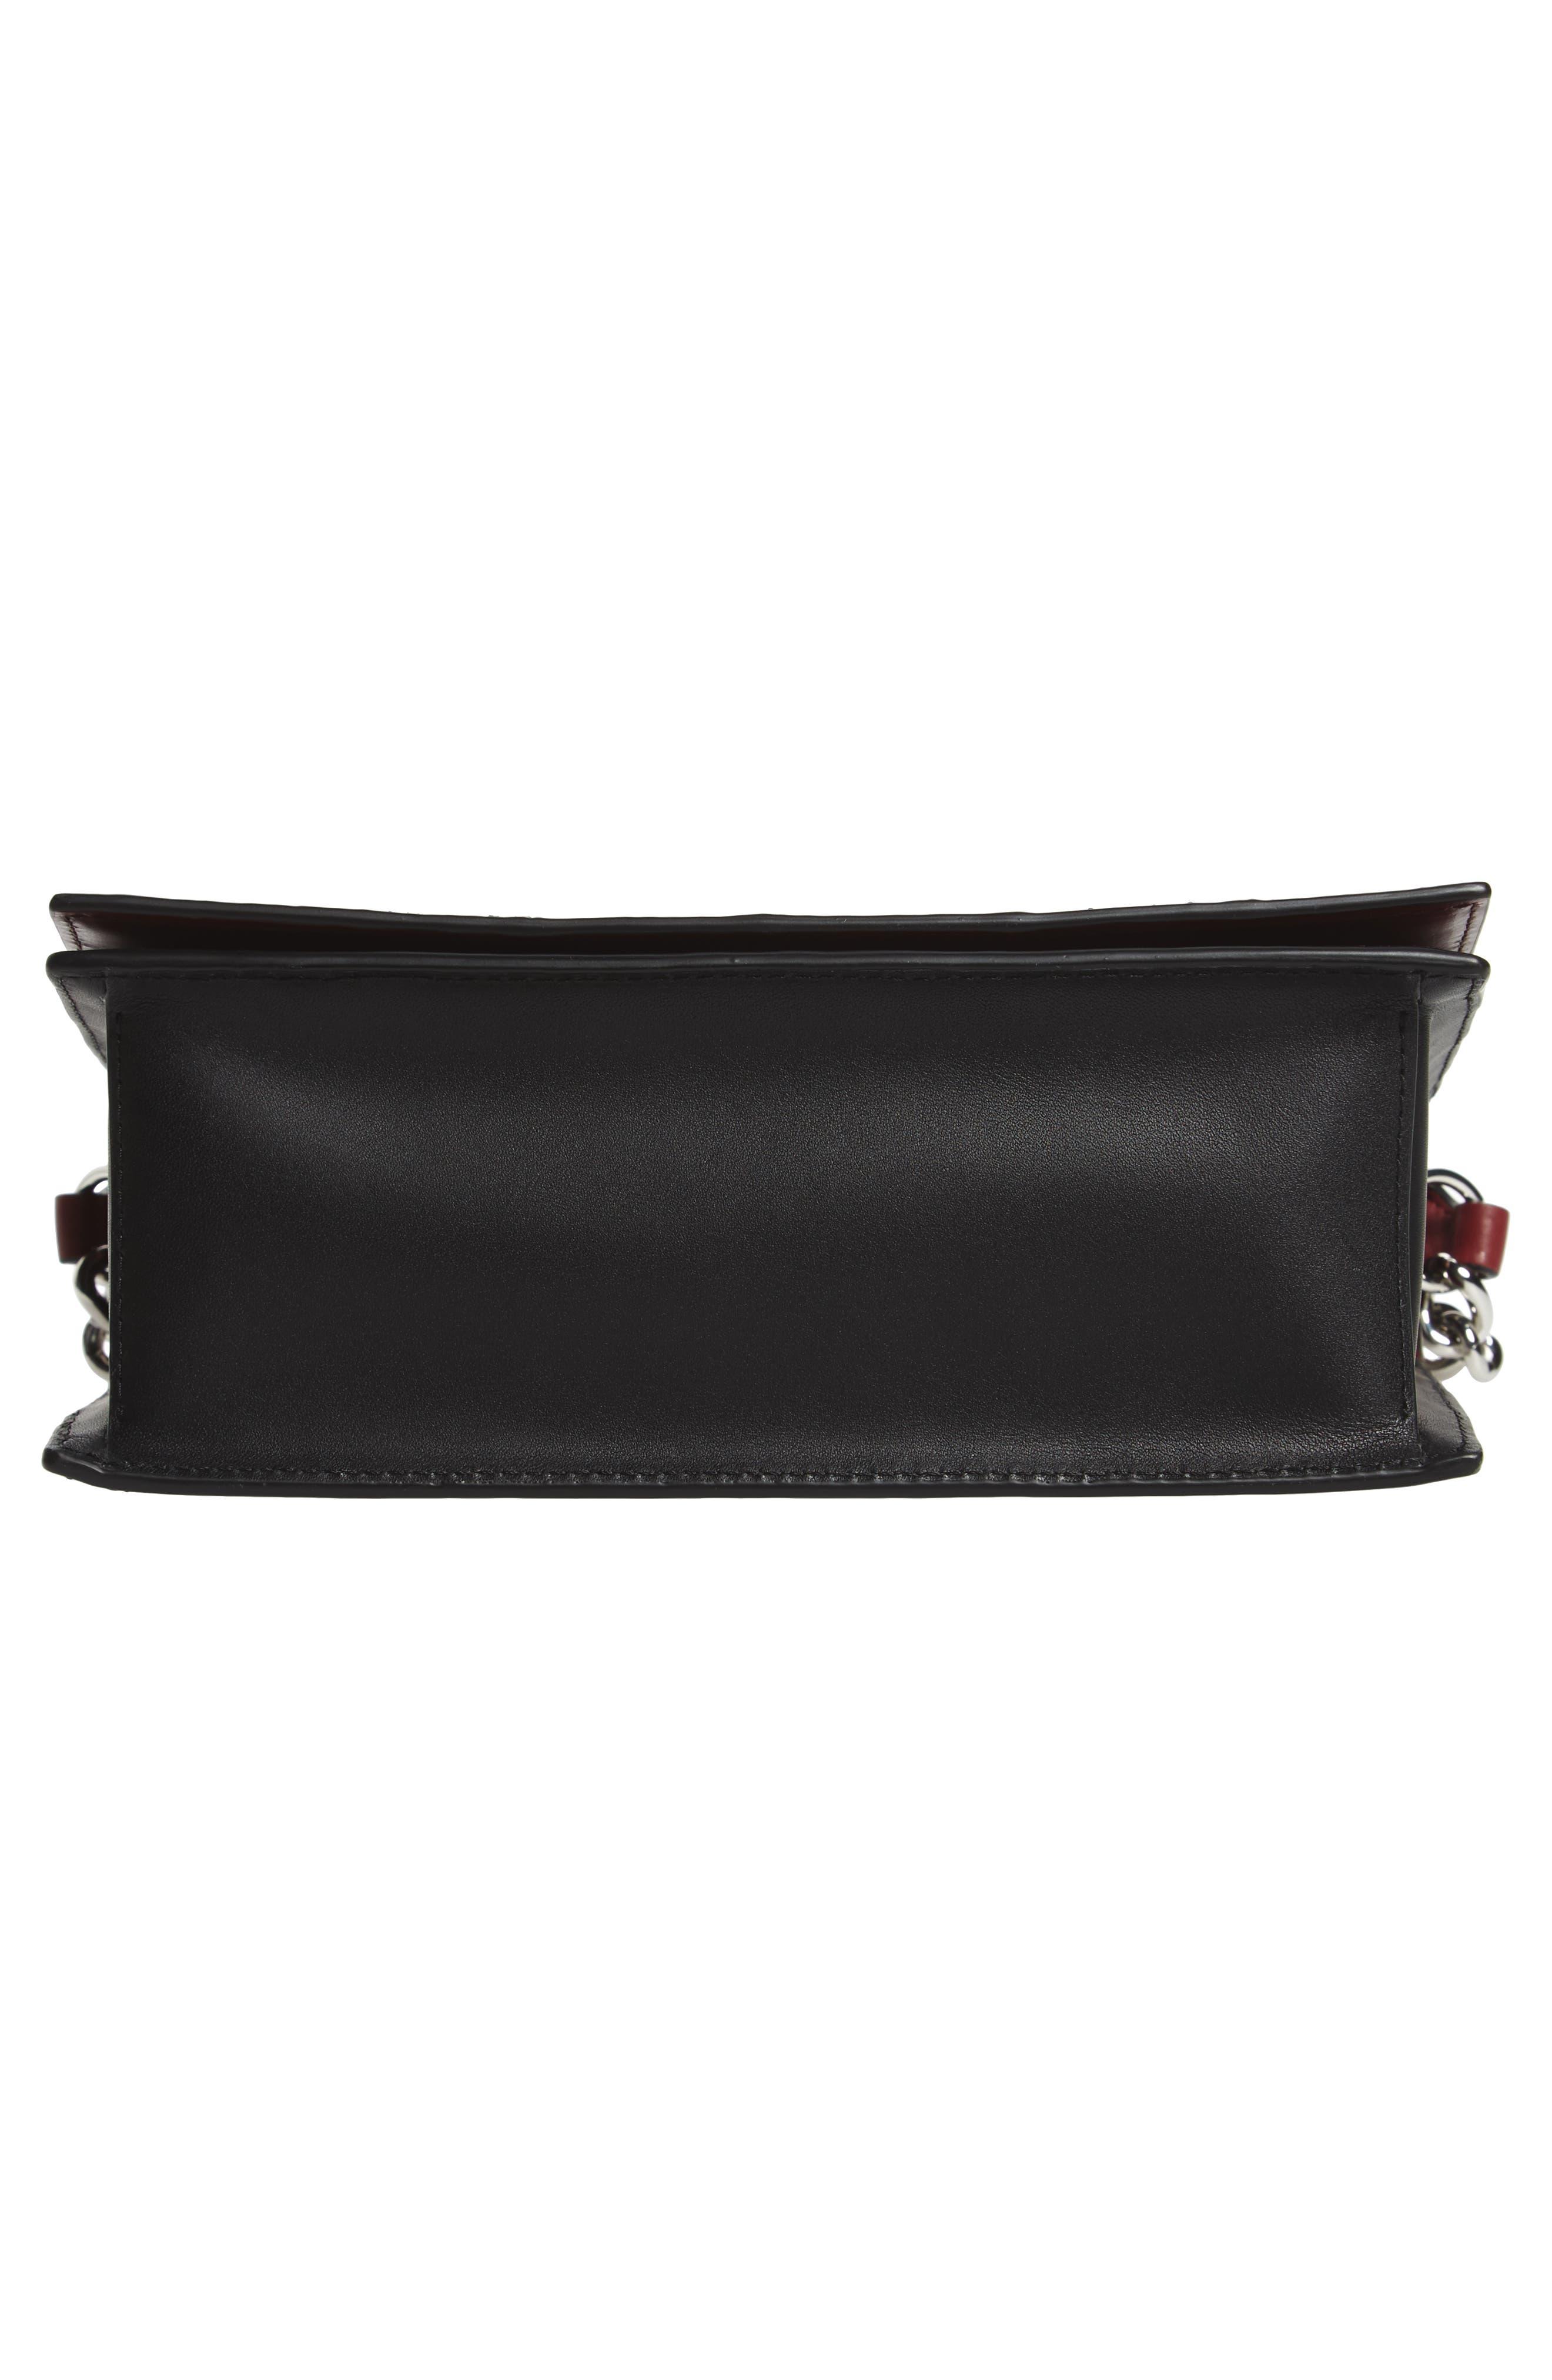 Bonne Soirée Leather & Genuine Snakeskin Top Handle Bag,                             Alternate thumbnail 6, color,